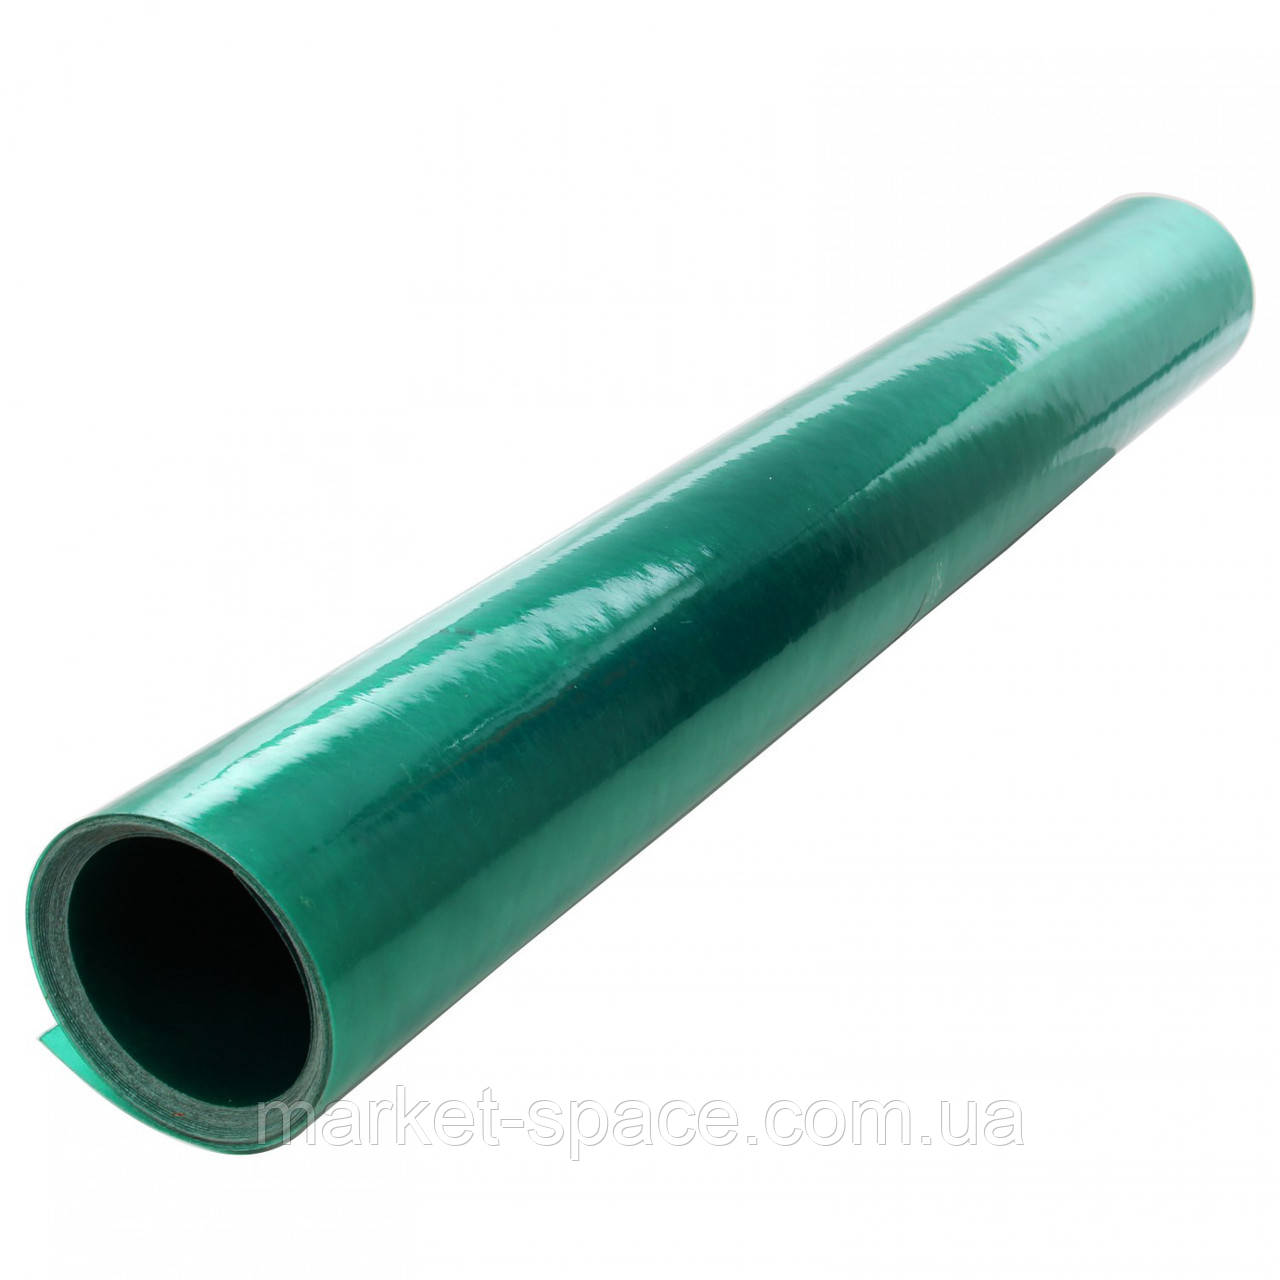 "Пластиковый шифер прямой ""Волнопласт"". Цвет: зеленый. Размер рулона: Д:20м*Ш:2м=40 кв.м"